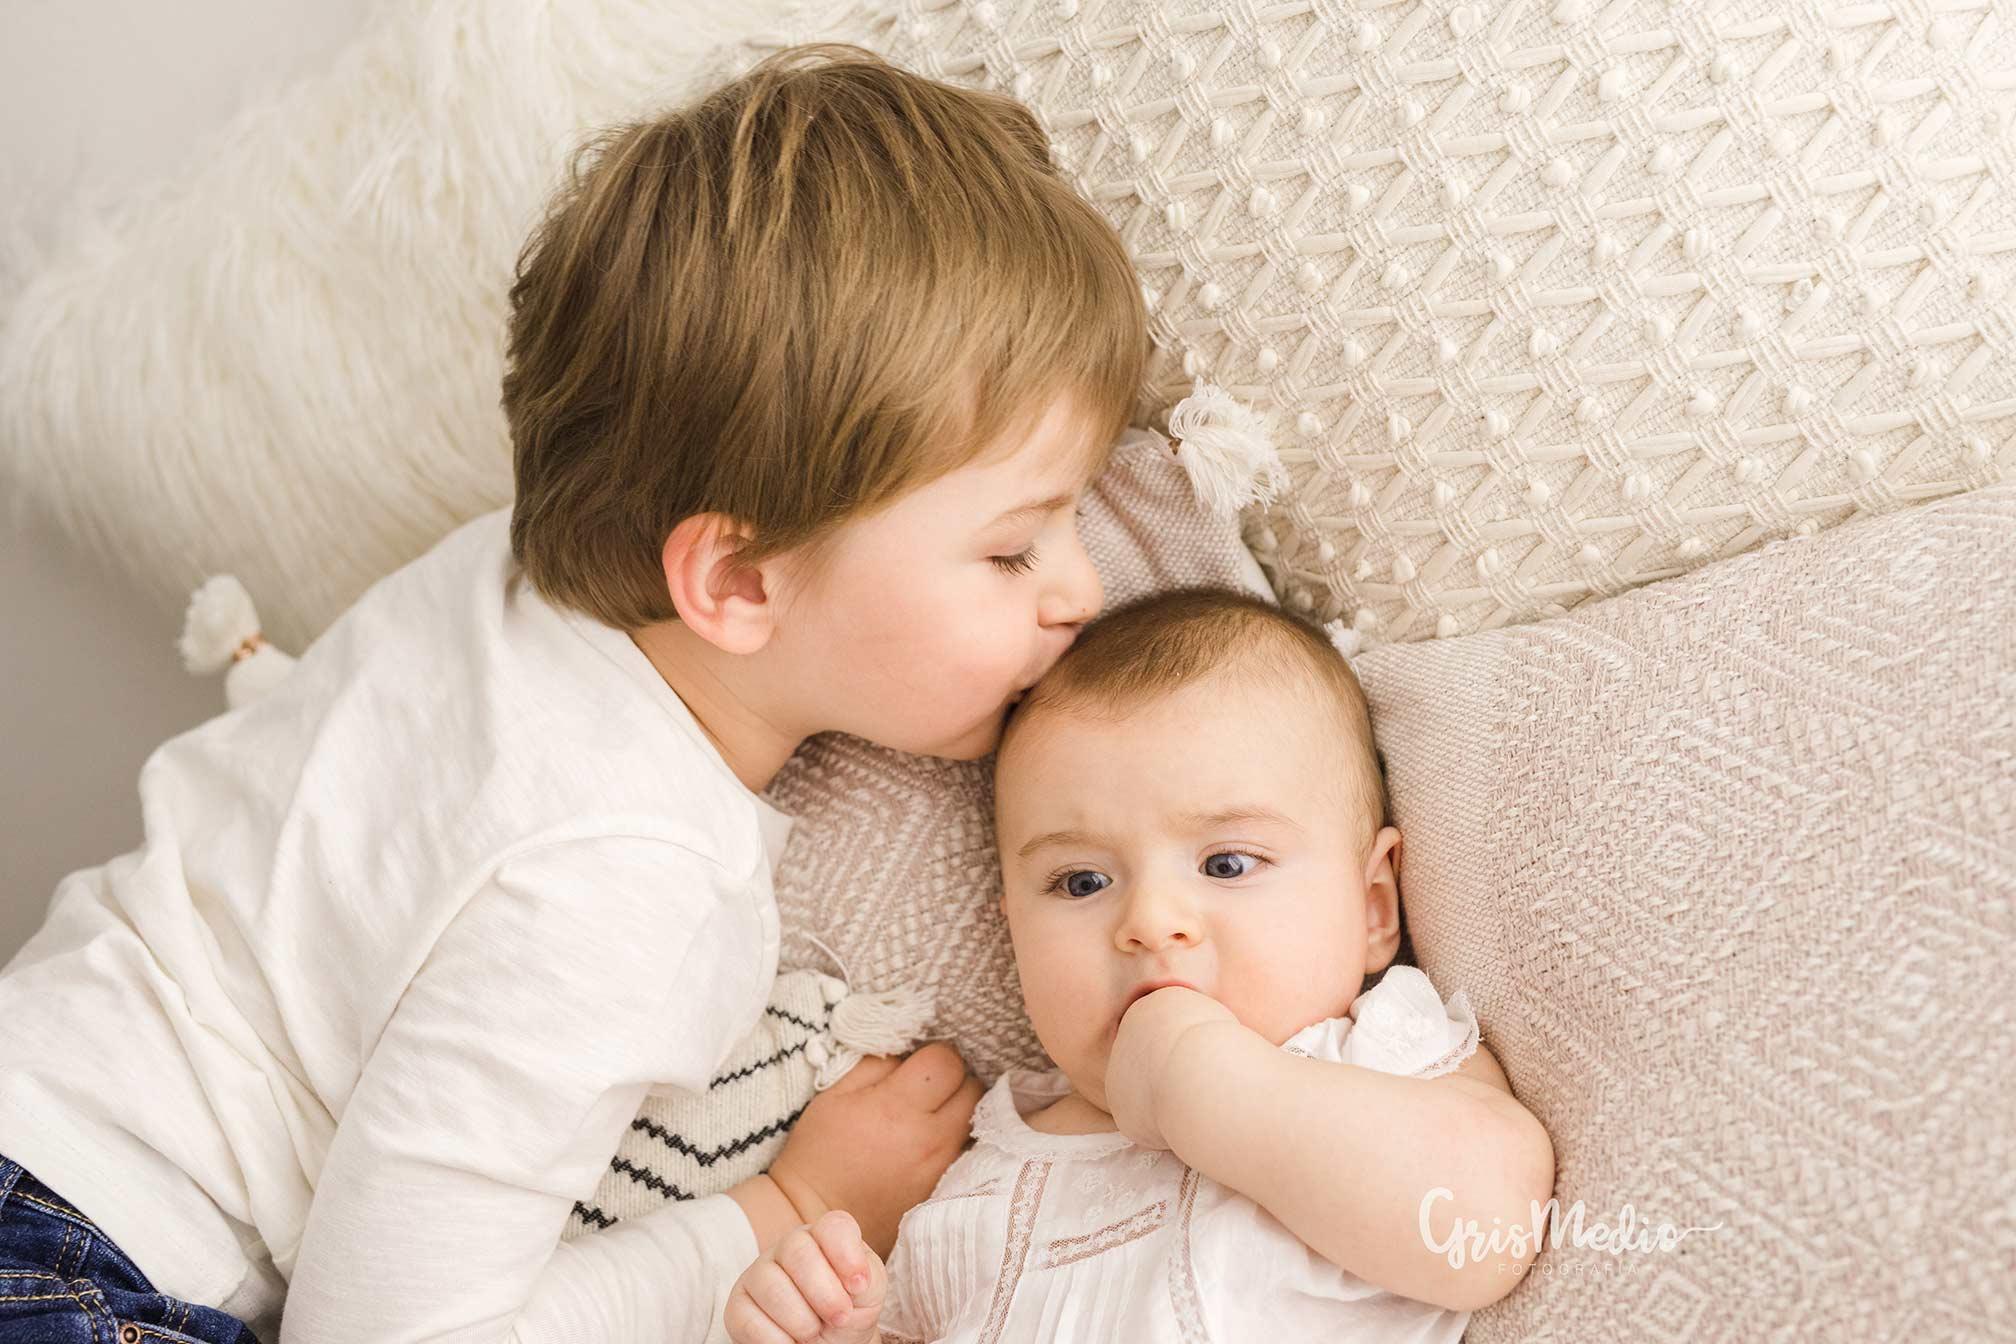 fotografia-familia-infantil-zaragoza-grismedio-bebe-lactancia2